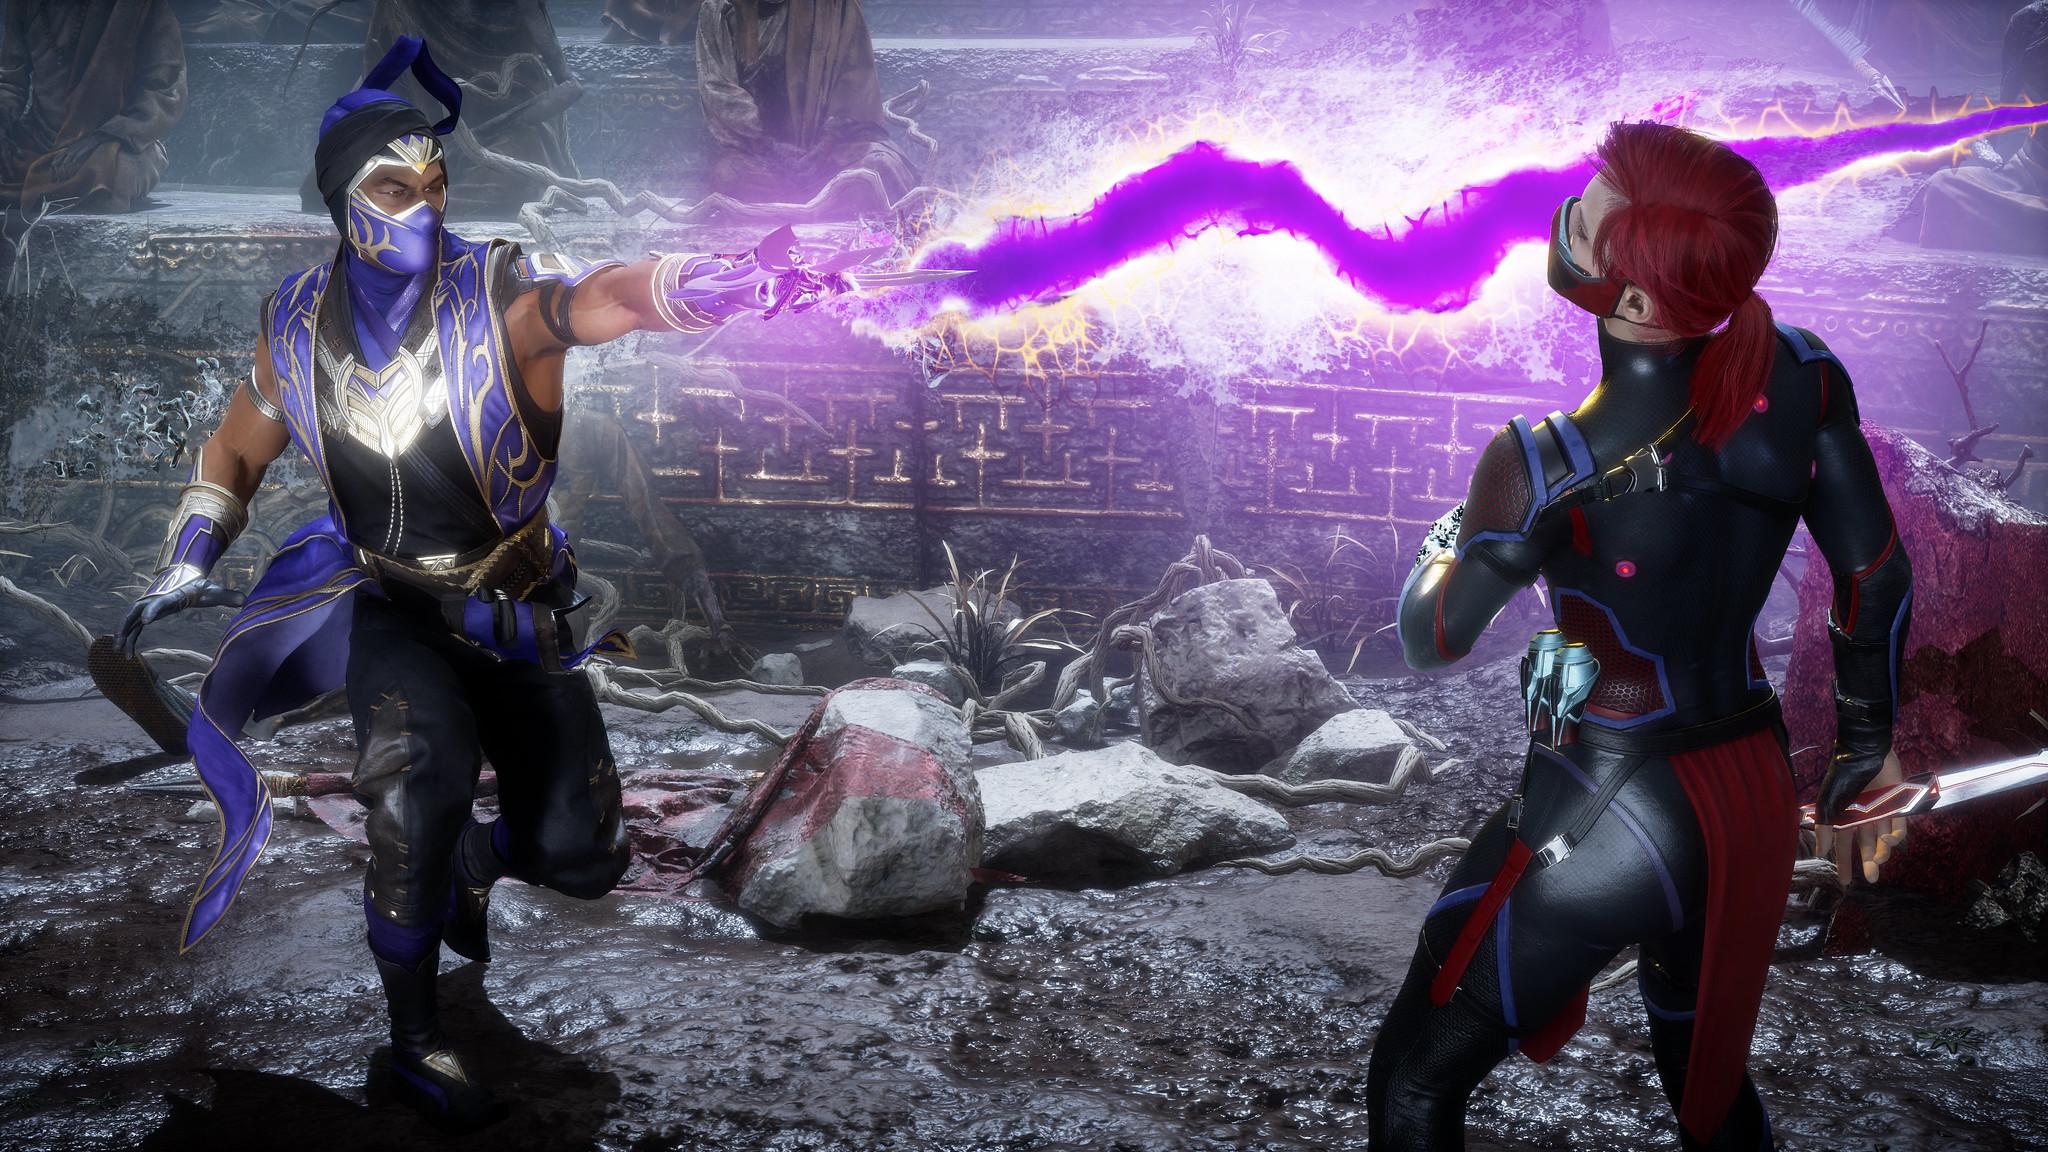 Mortal Kombat 11 PC, PS4, XONE, Switch Games Image 13/17, NetherRealm Studios , Warner Bros. Interactive Entertainment